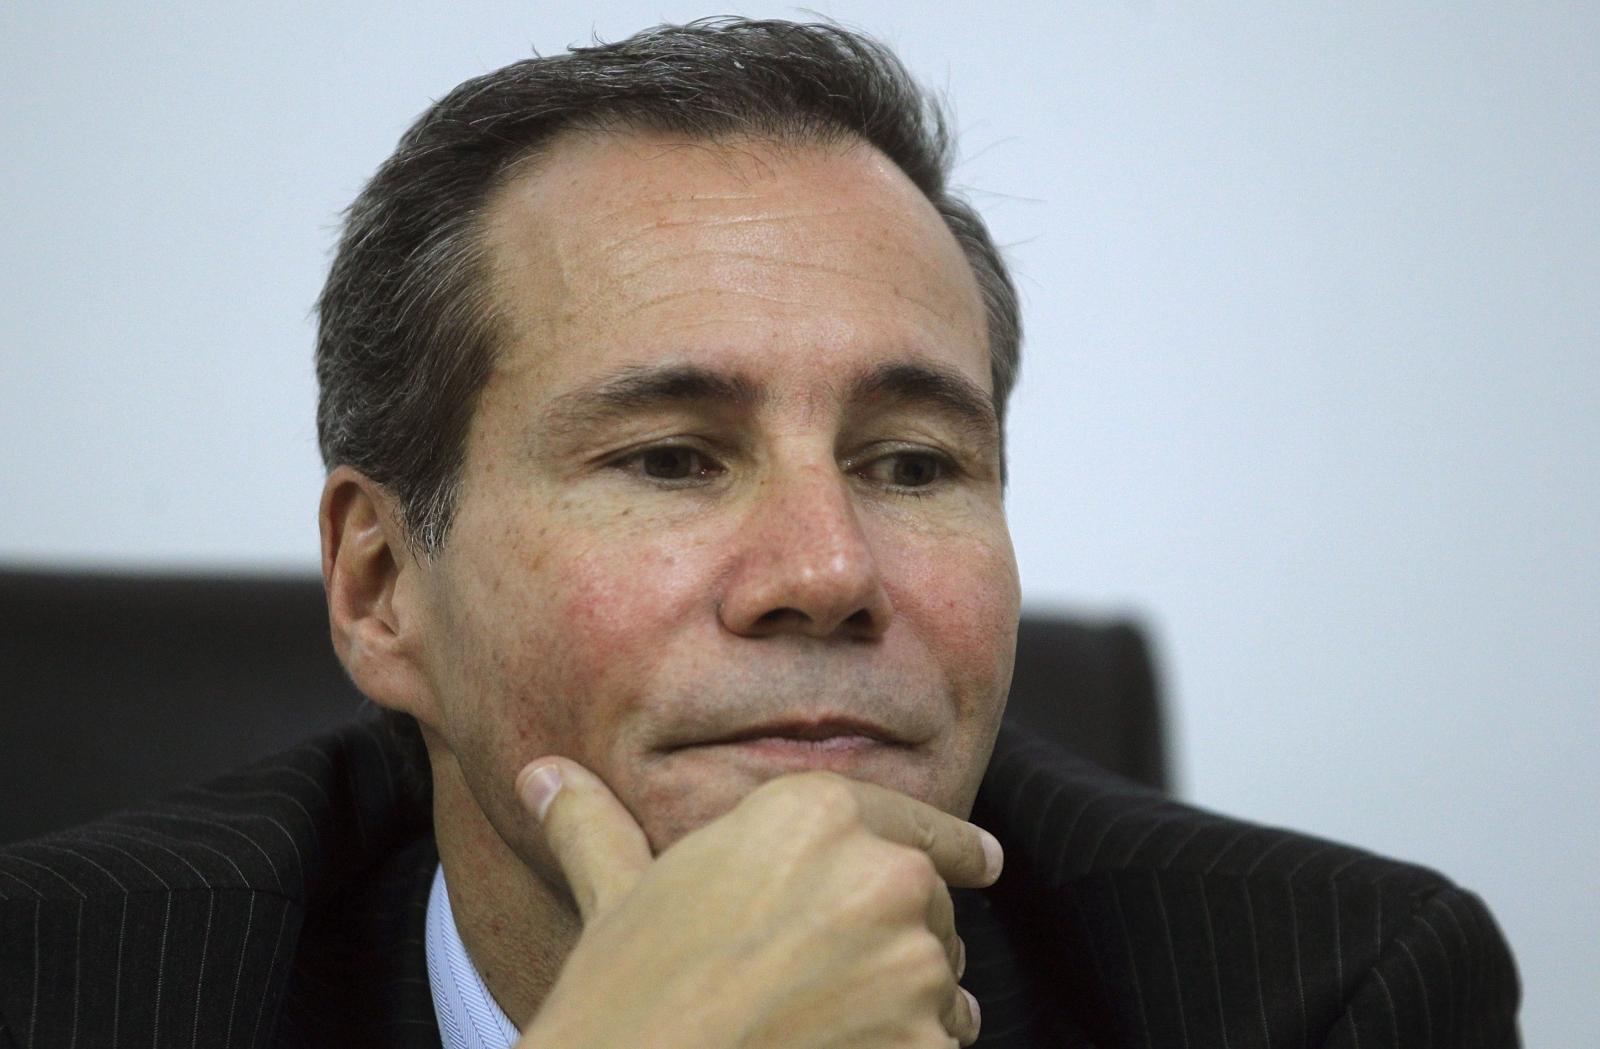 Late Argentine prosecutor Alberto Nisman